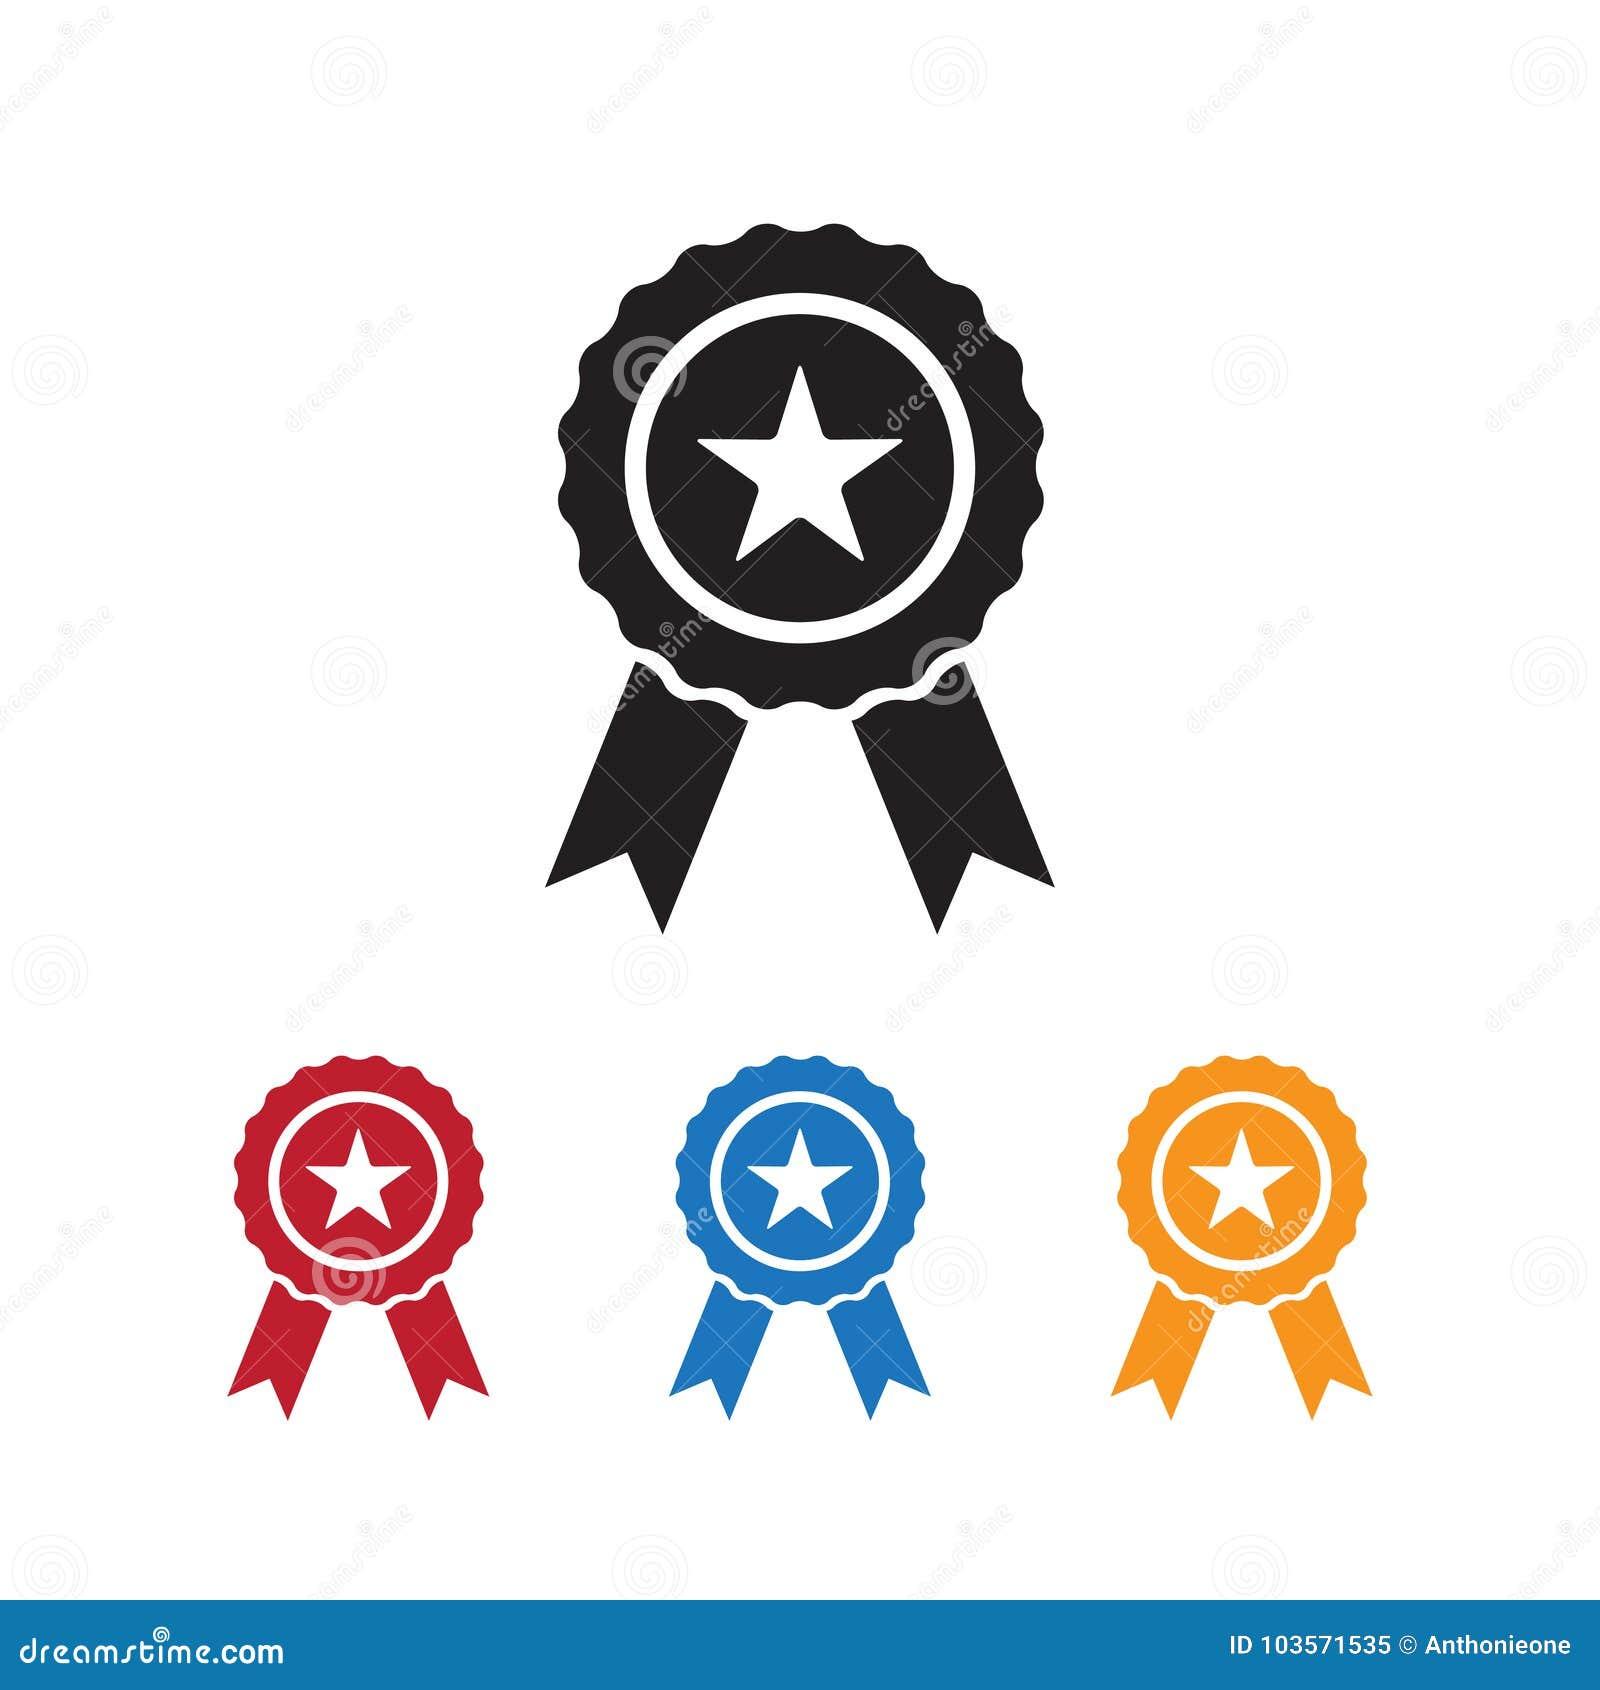 ribbon award icon with star illustration on white background stock